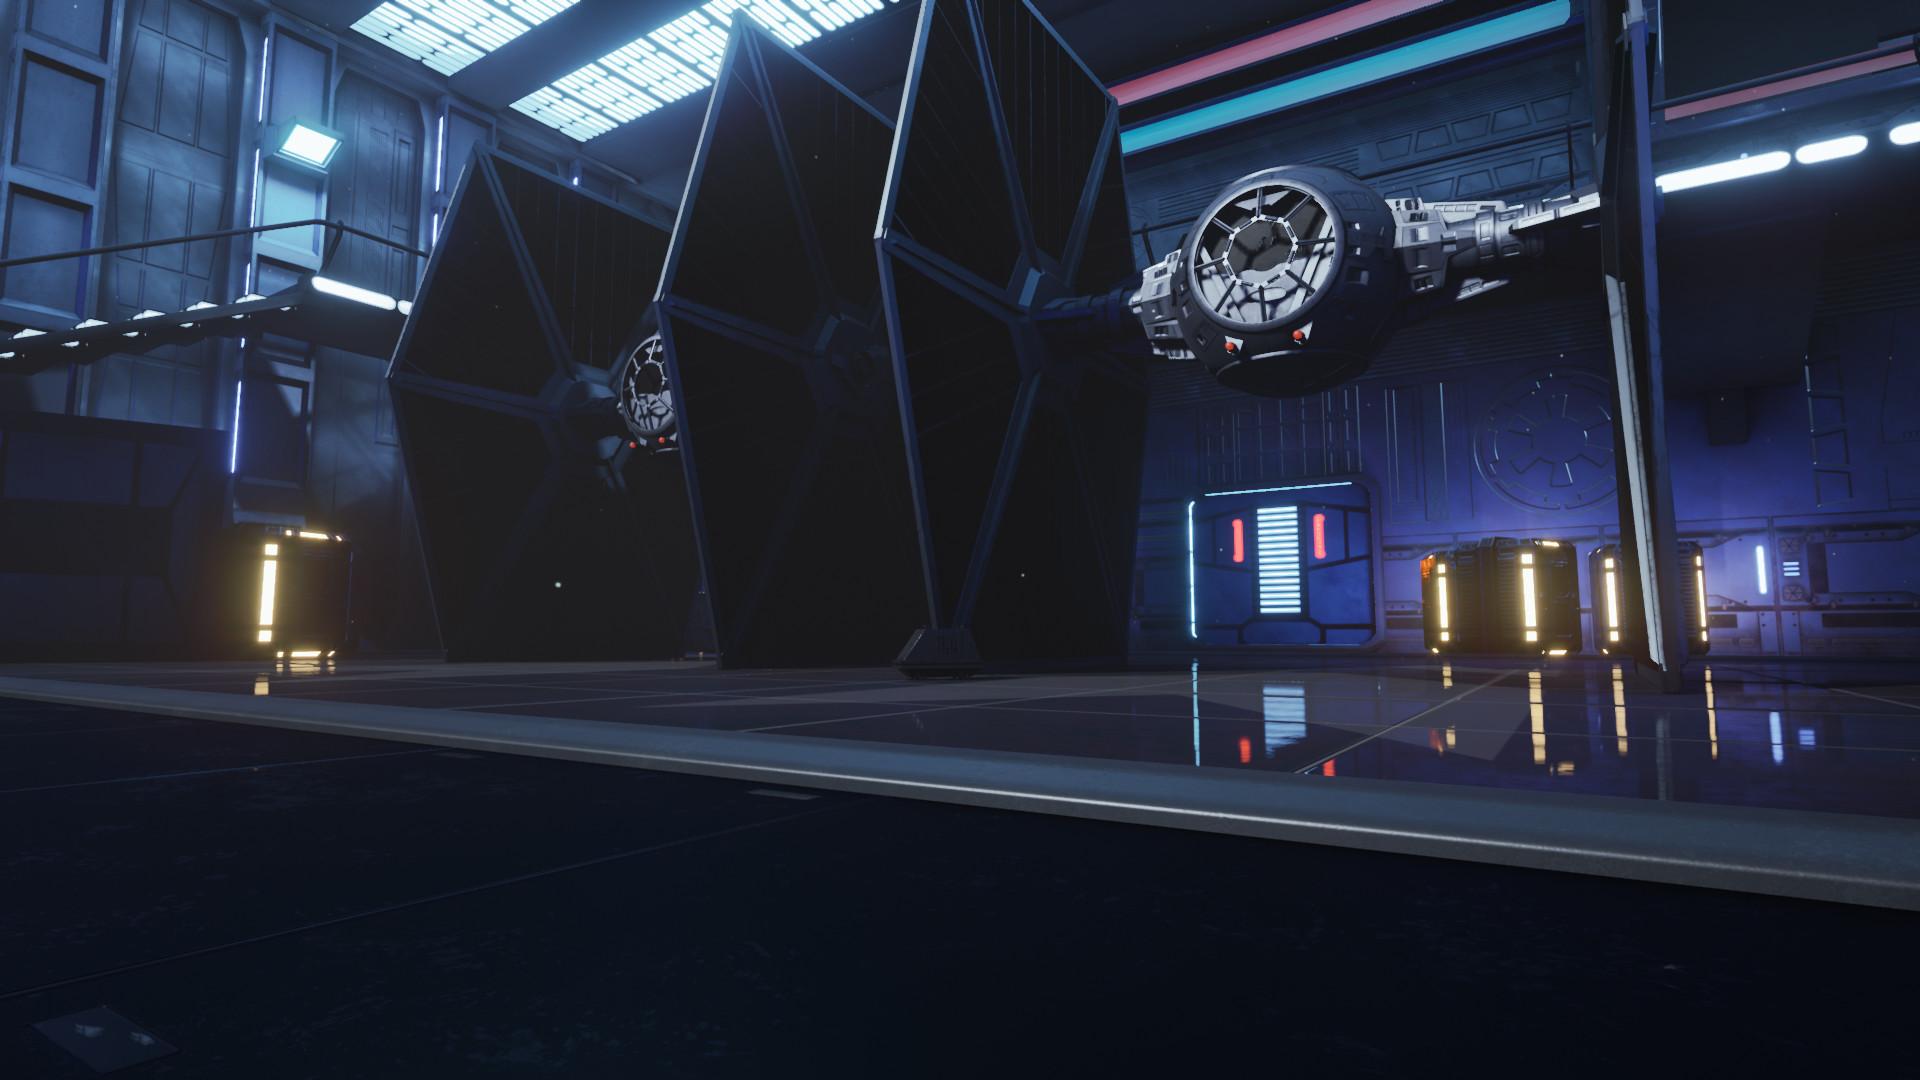 Artstation Star Wars Jedi Knight 2 Jedi Outcast Mission On